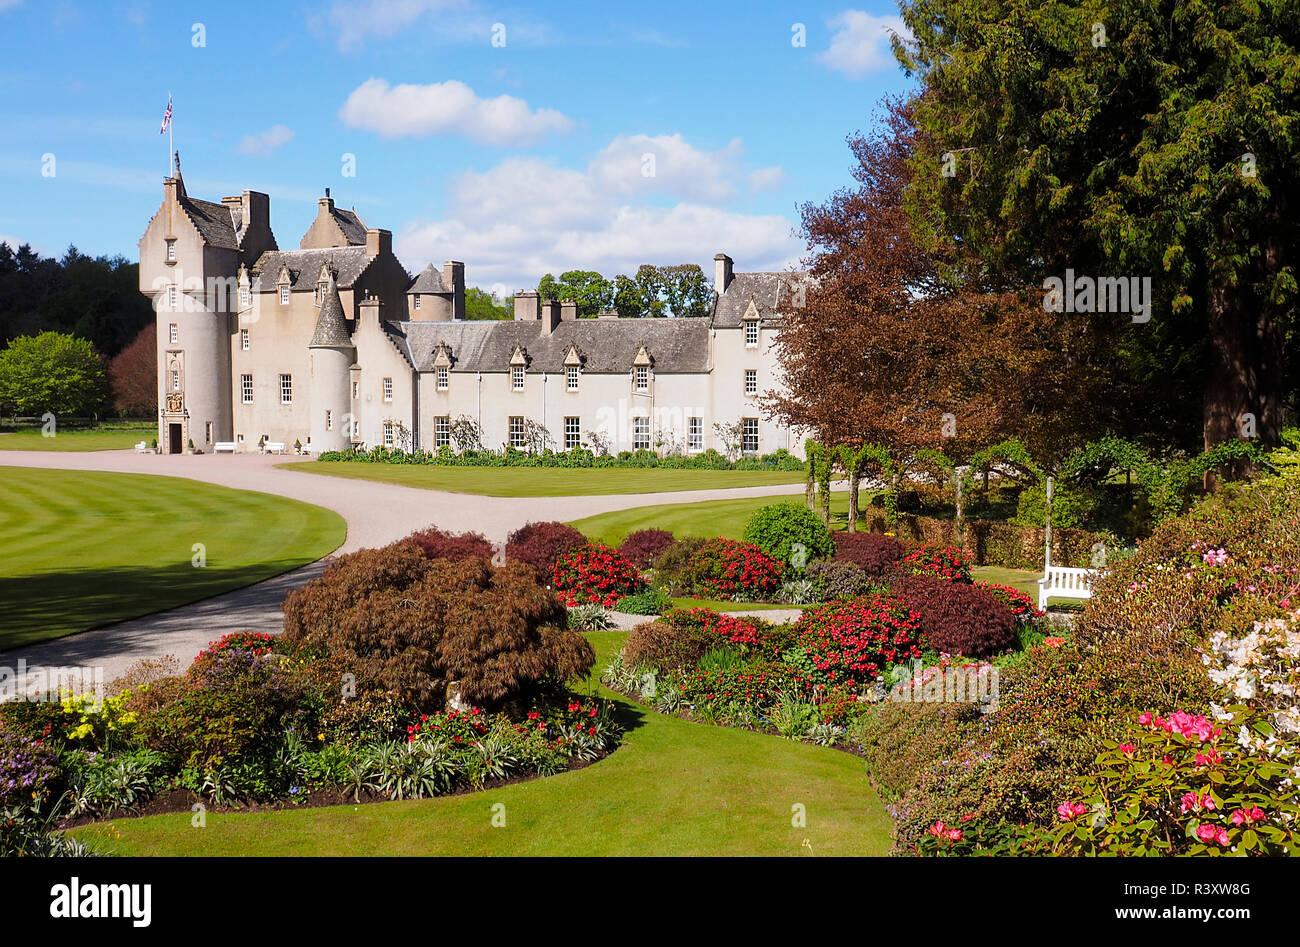 Ballindalloch Castle Scottish Highlands - Stock Image